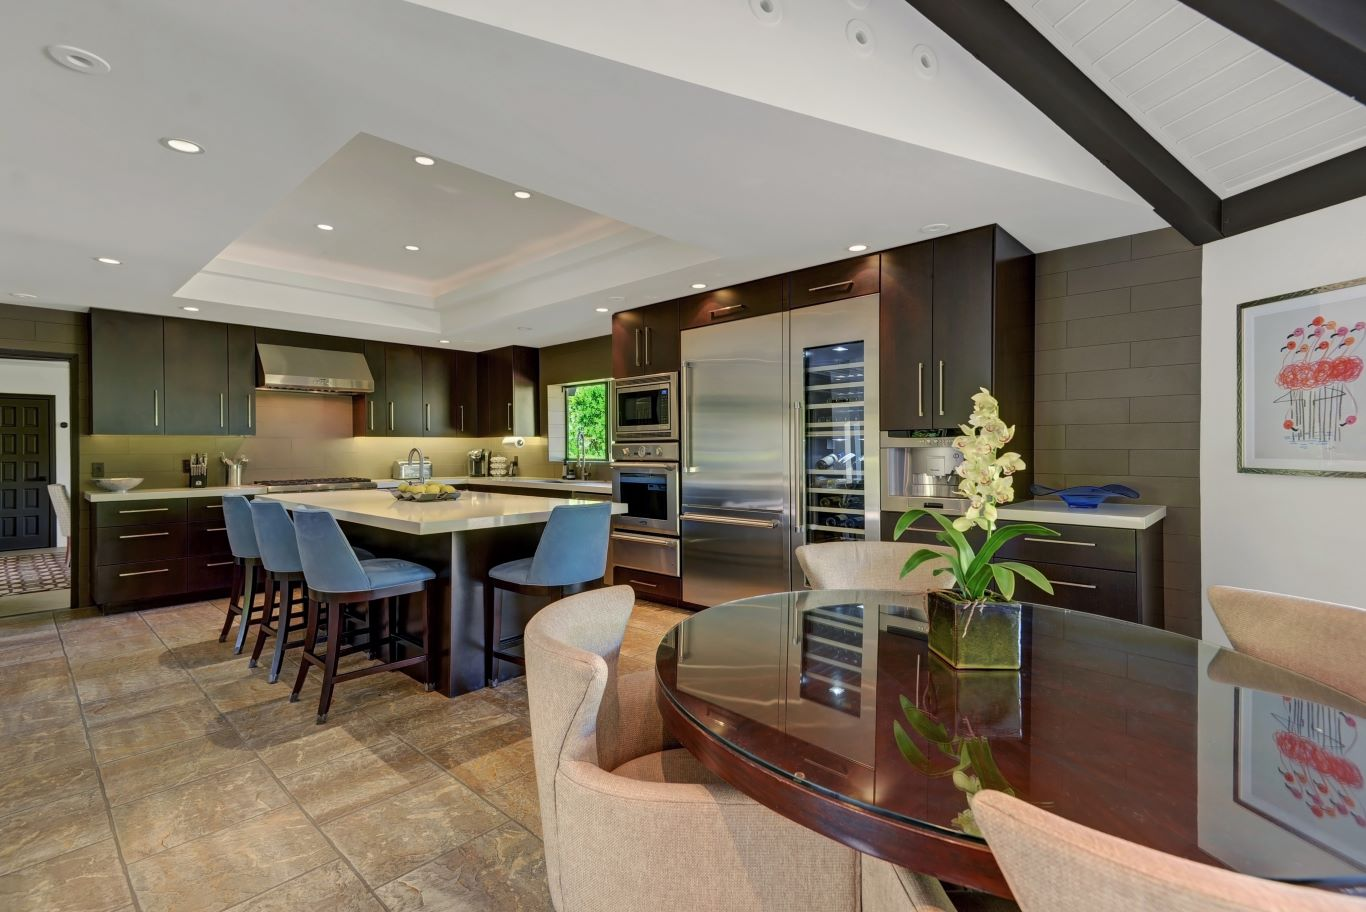 Kitchen Table to Kitchen